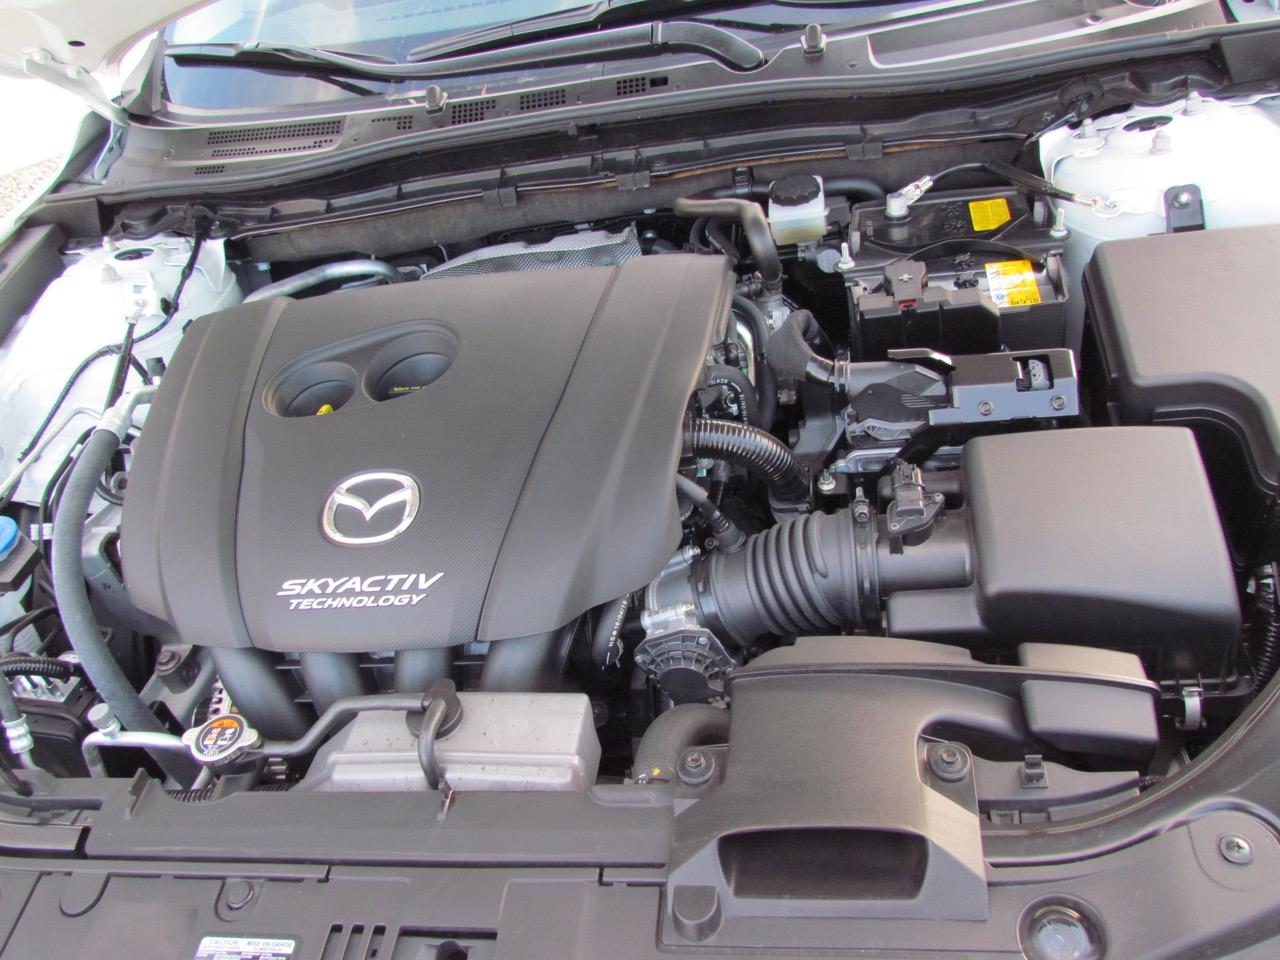 Engine provides 814 horsepower